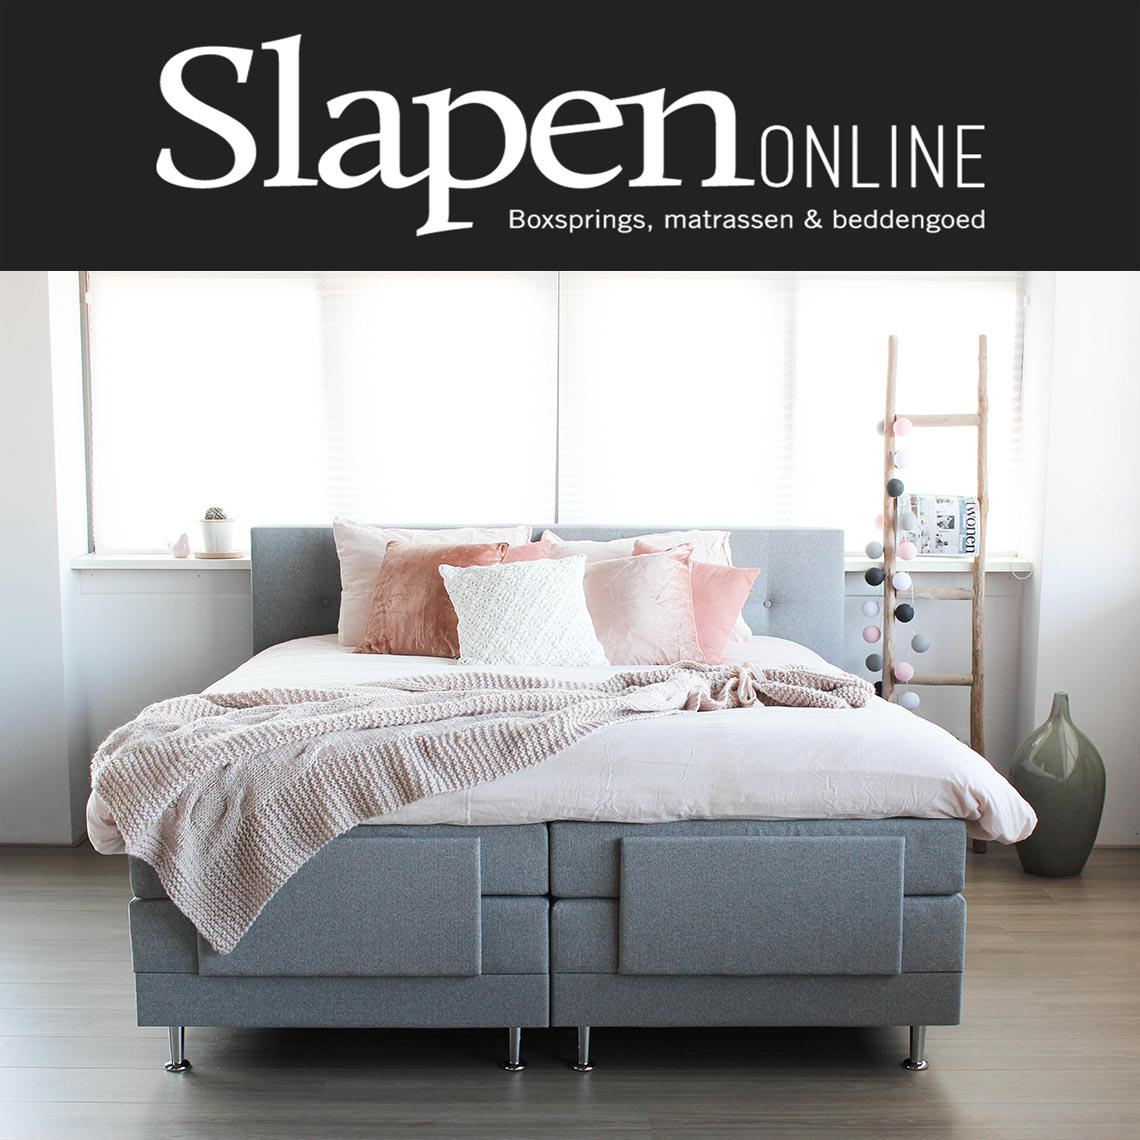 goedkope complete boxspring 200x200 slapen online. Black Bedroom Furniture Sets. Home Design Ideas